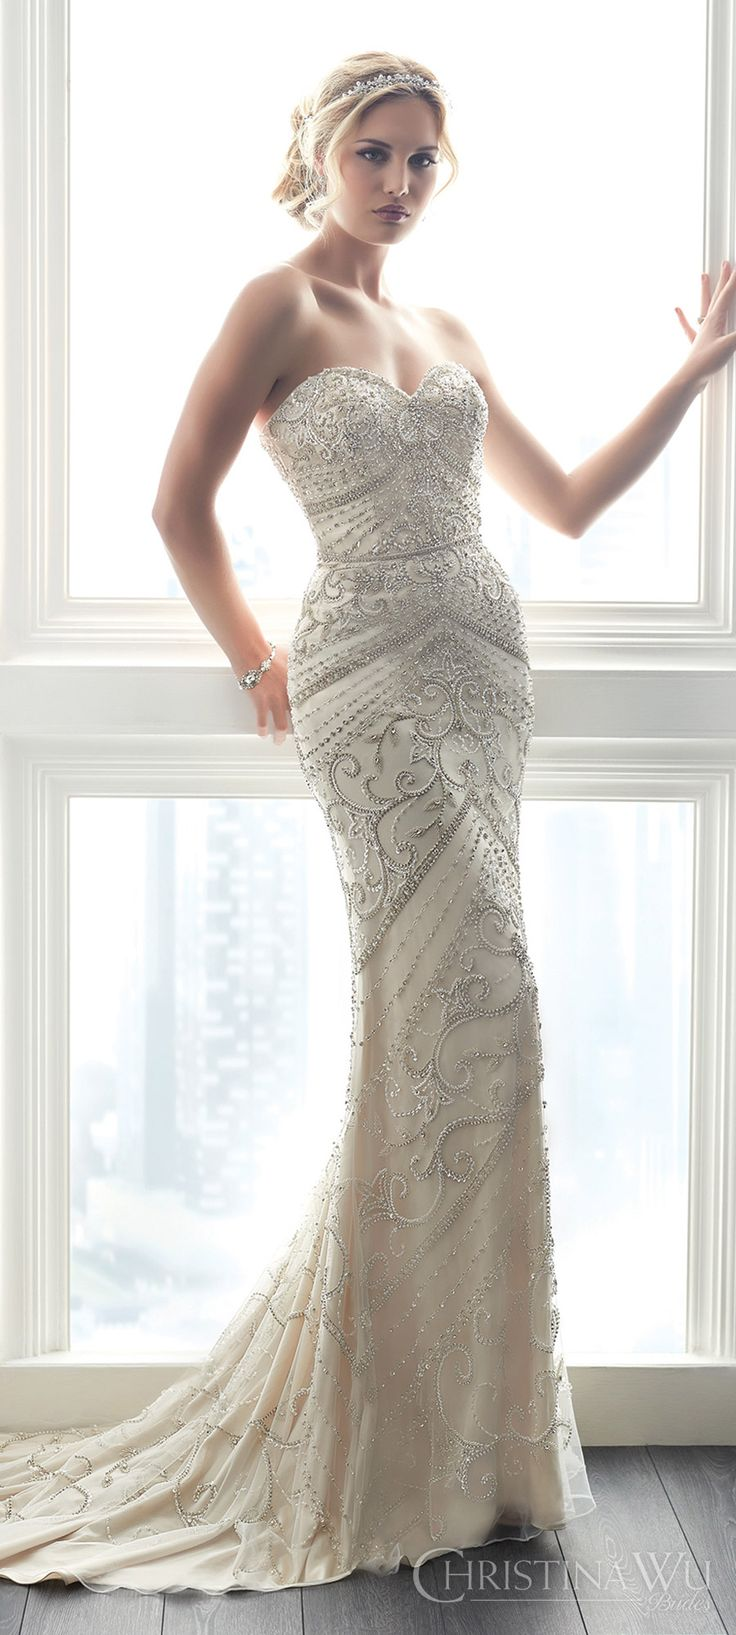 Best 25+ Beaded wedding dresses ideas on Pinterest